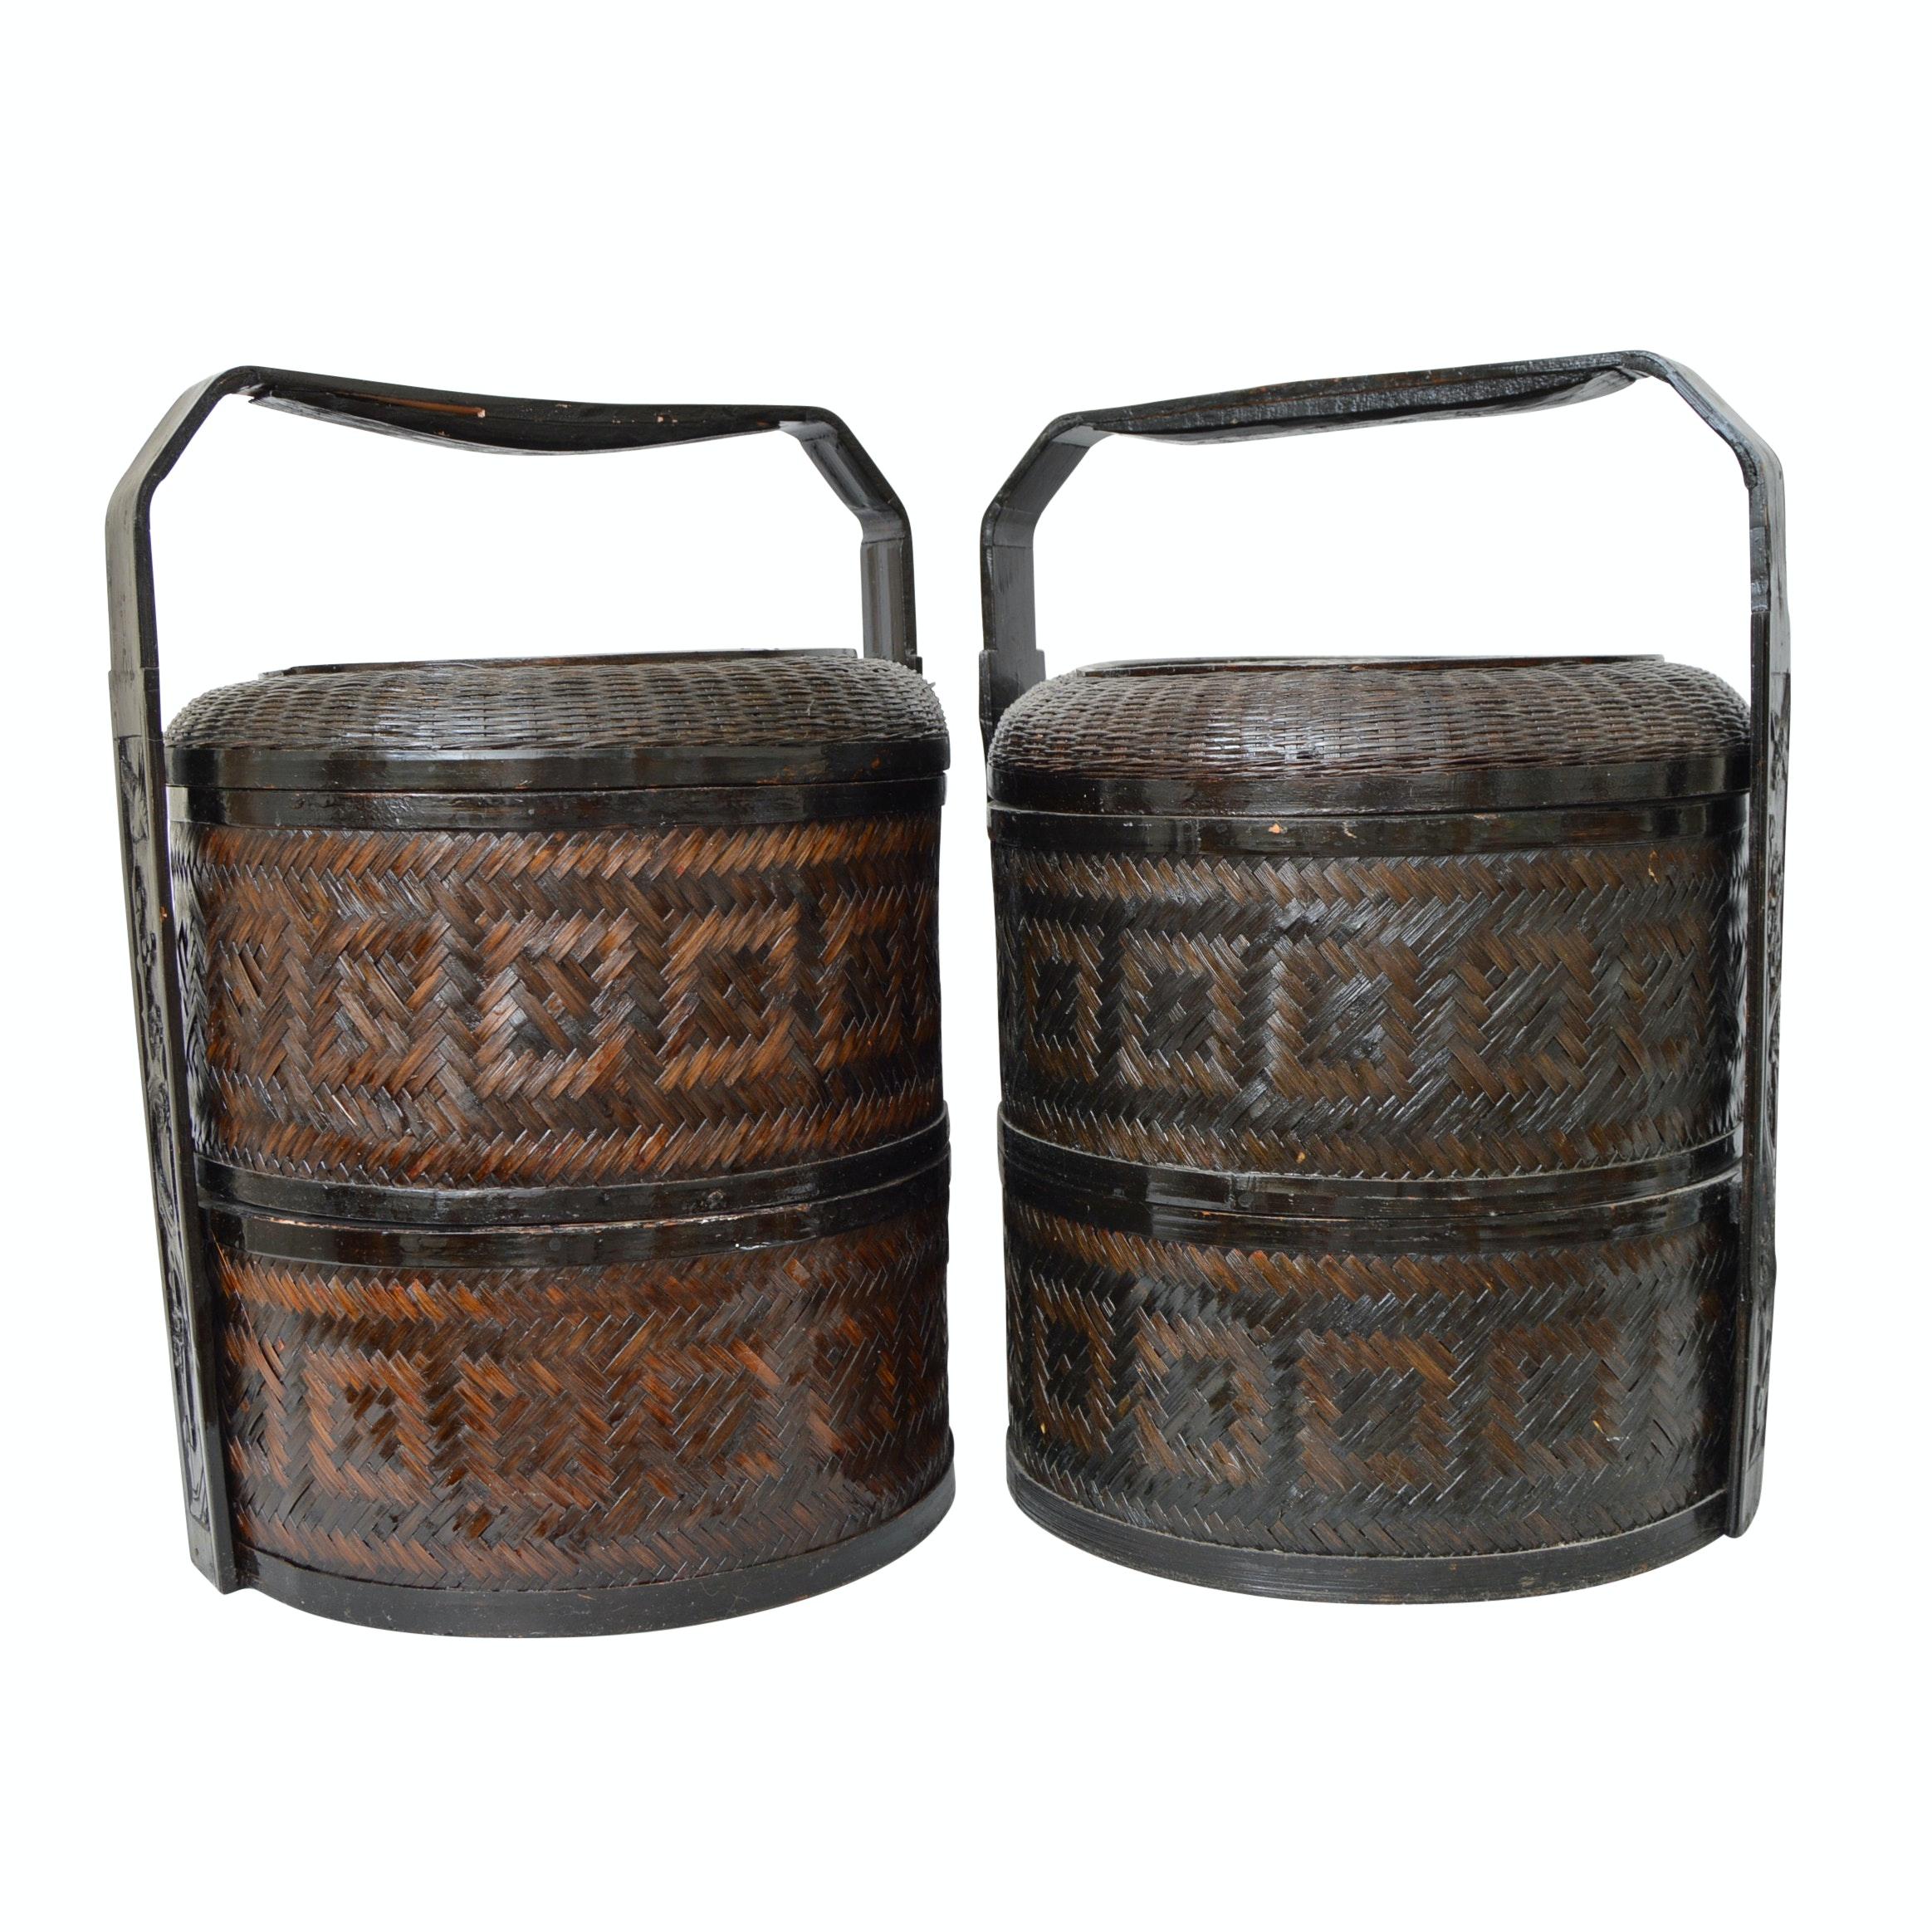 Chinese Wedding Baskets